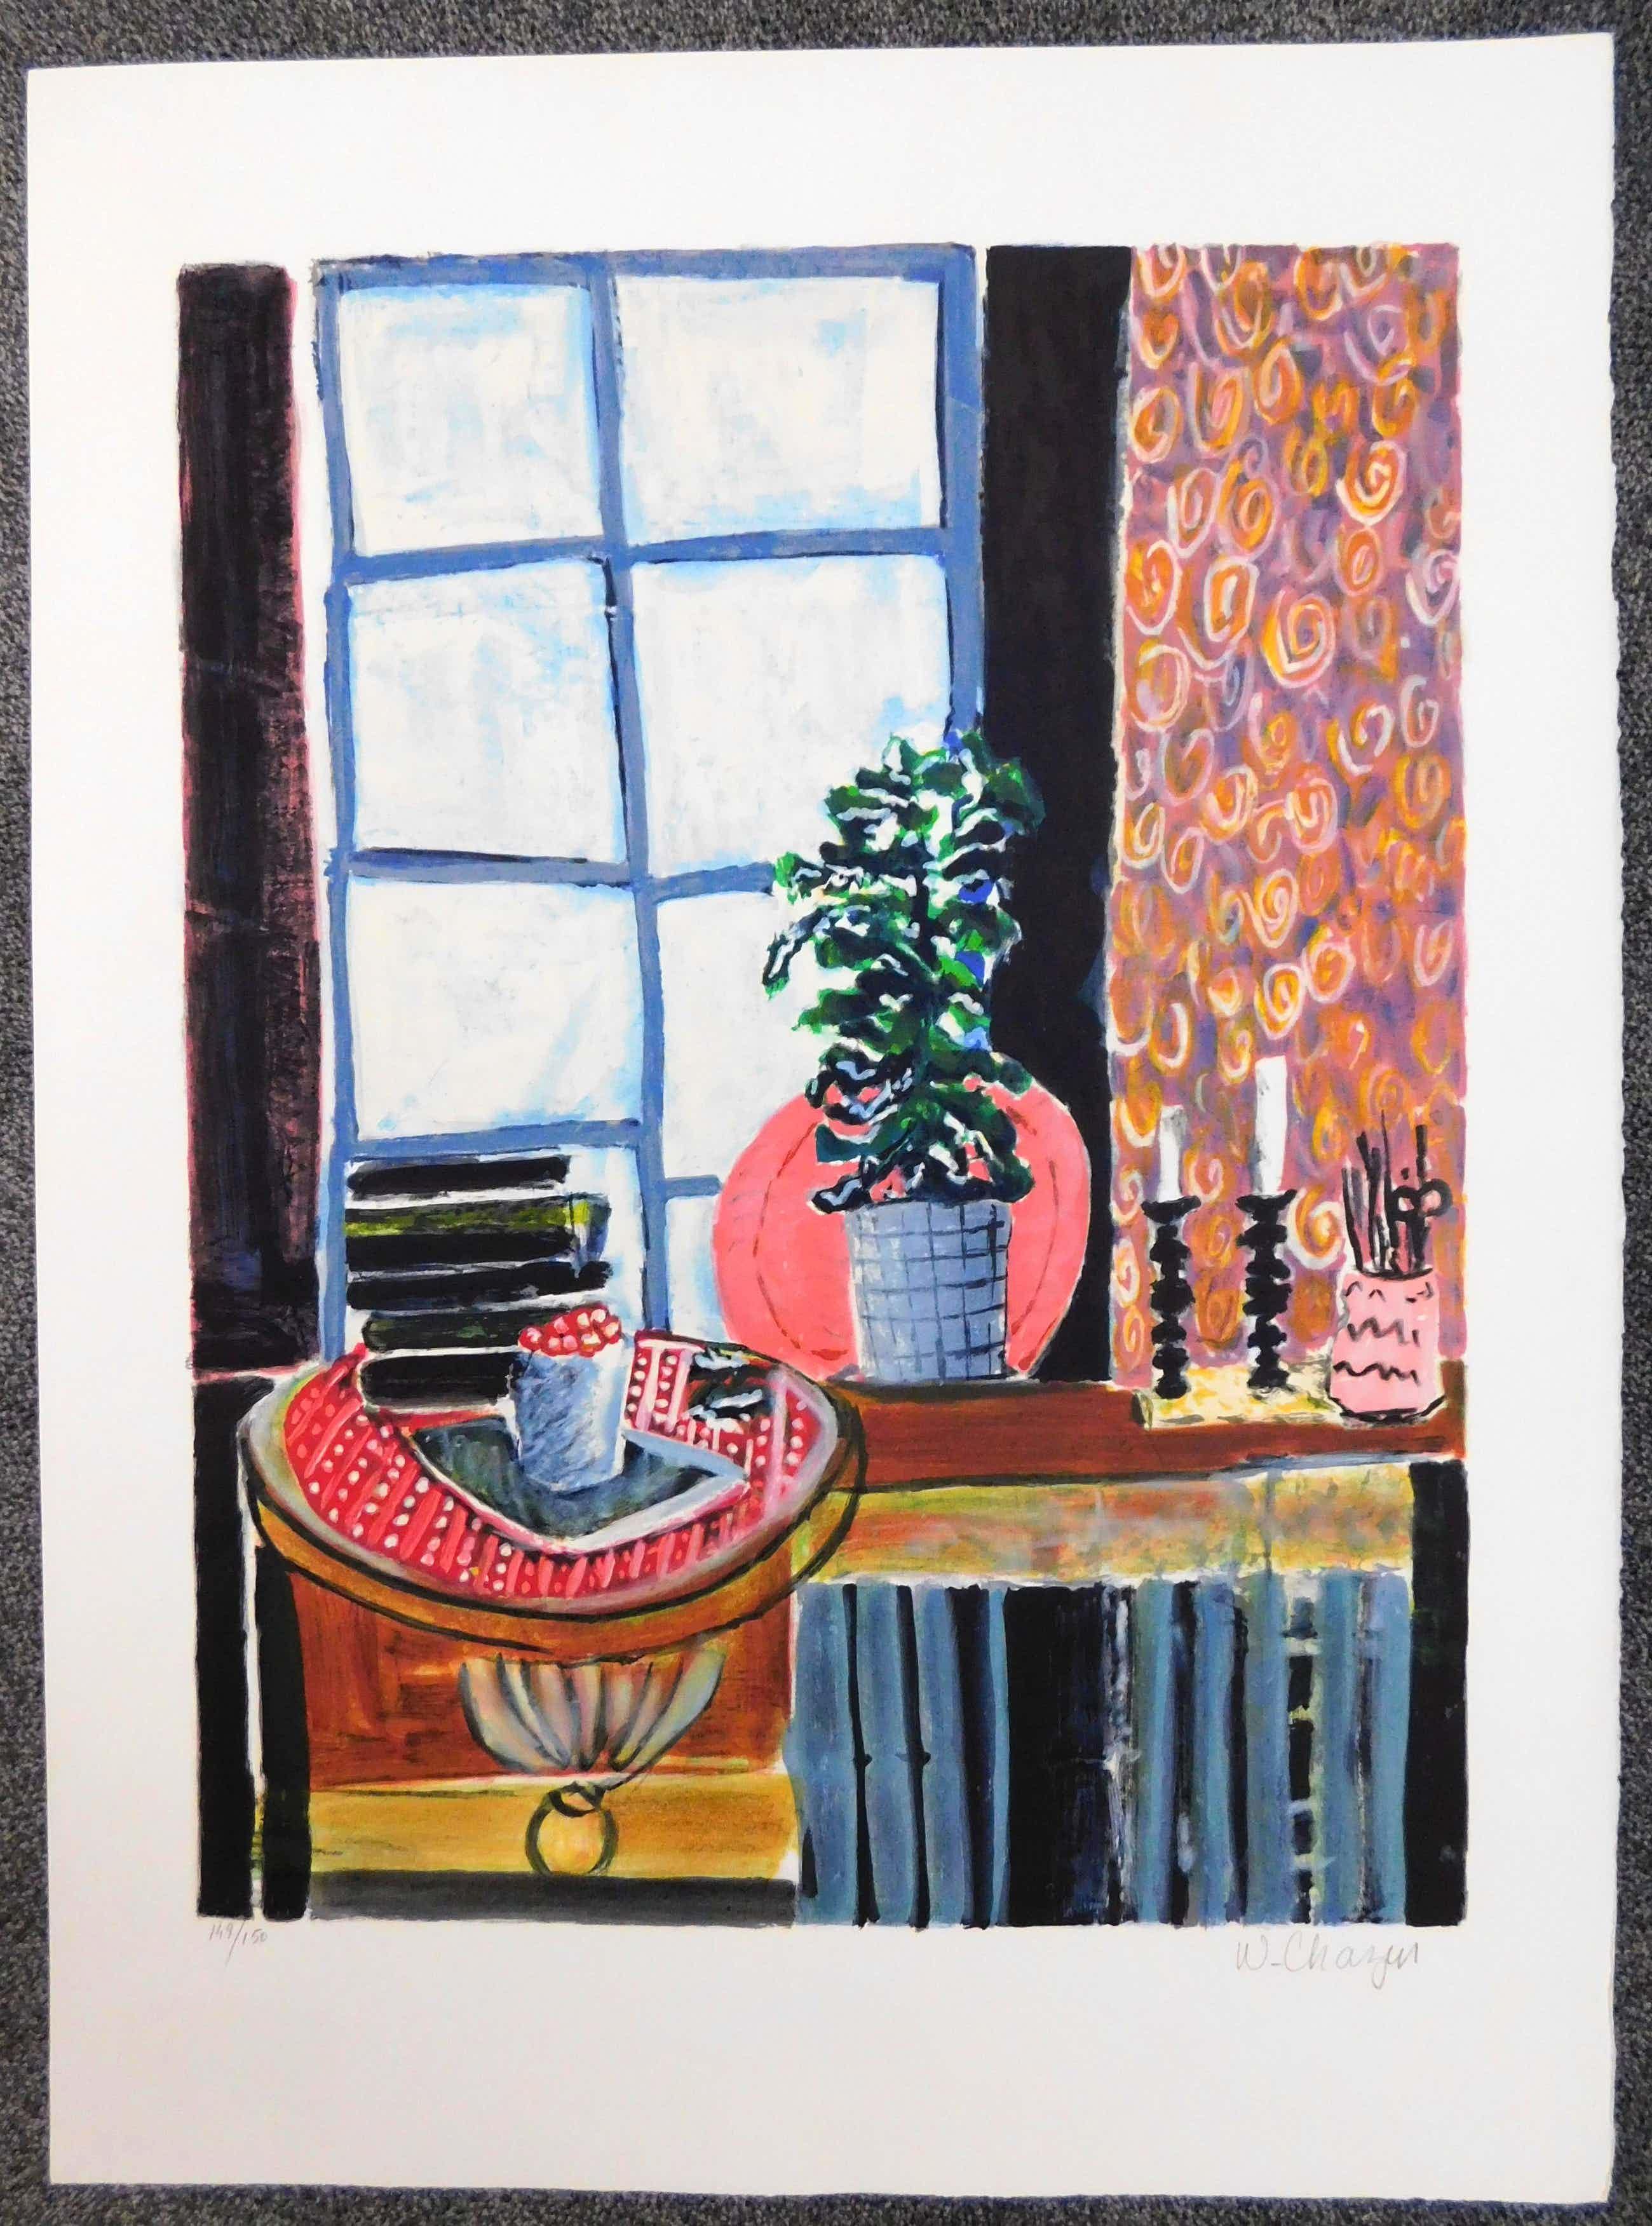 Wendy Chazin - Still-life with Candlesticks kopen? Bied vanaf 55!